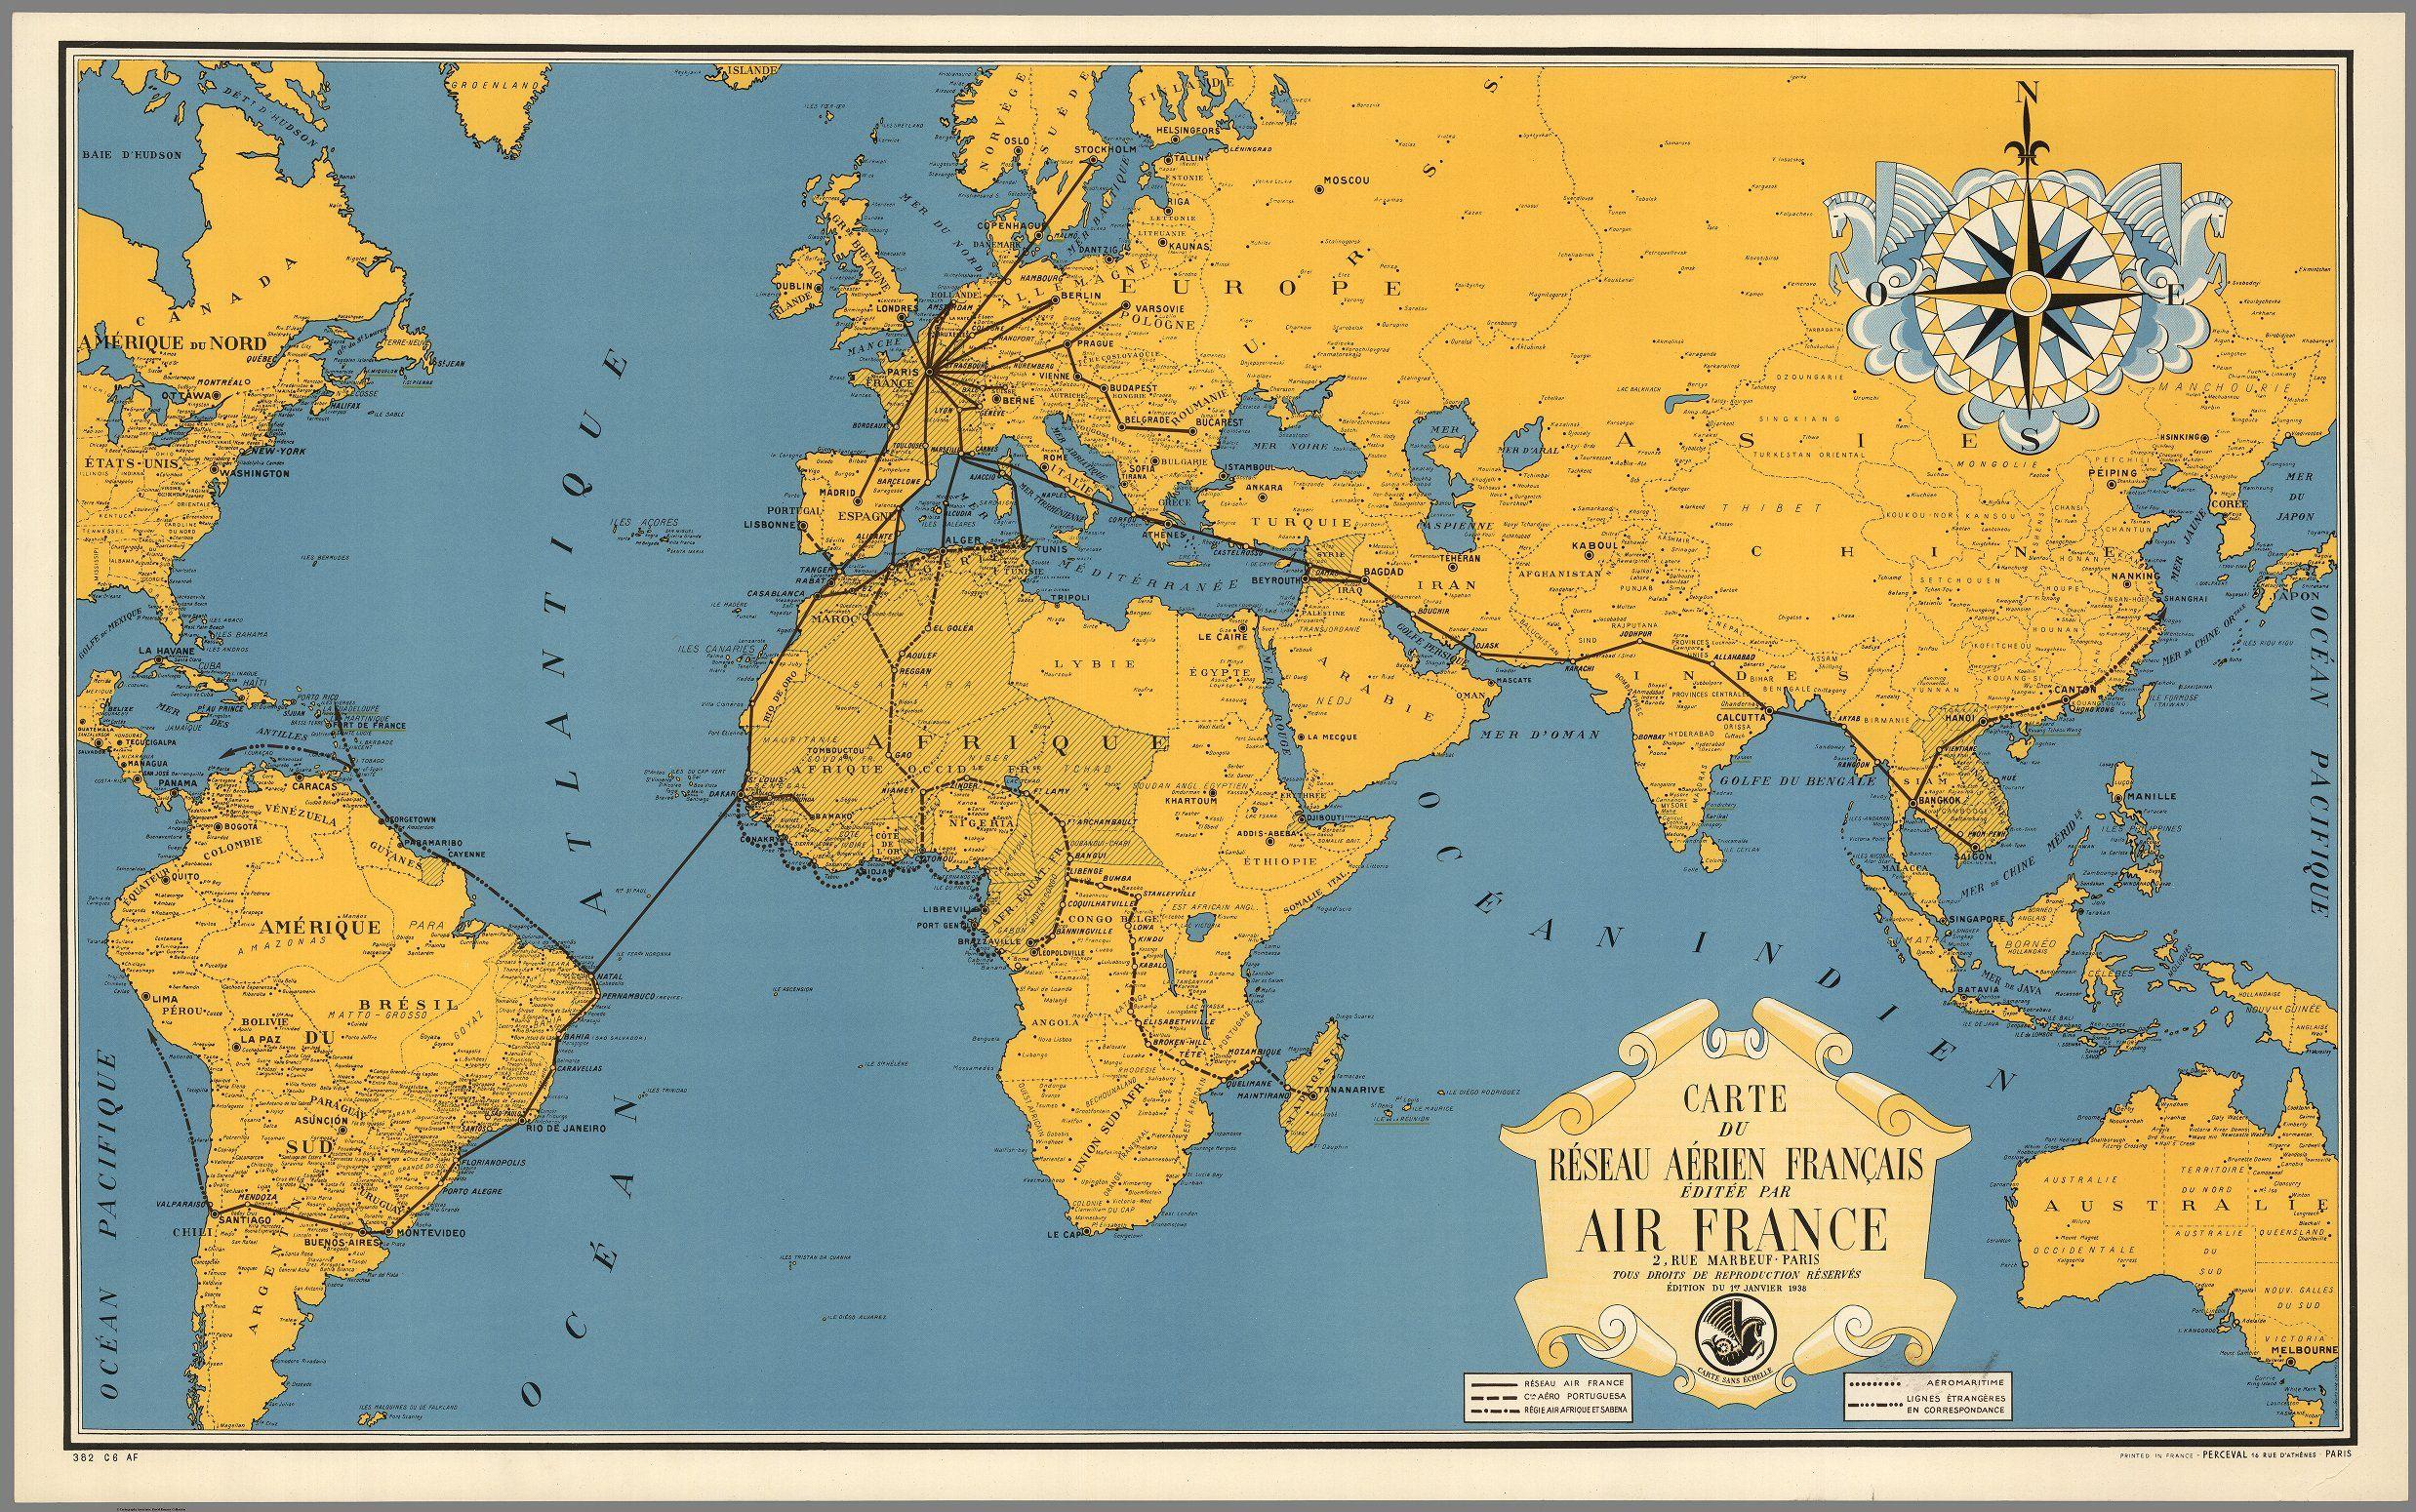 20 Free Vintage Map Printable Images Remodelaholic